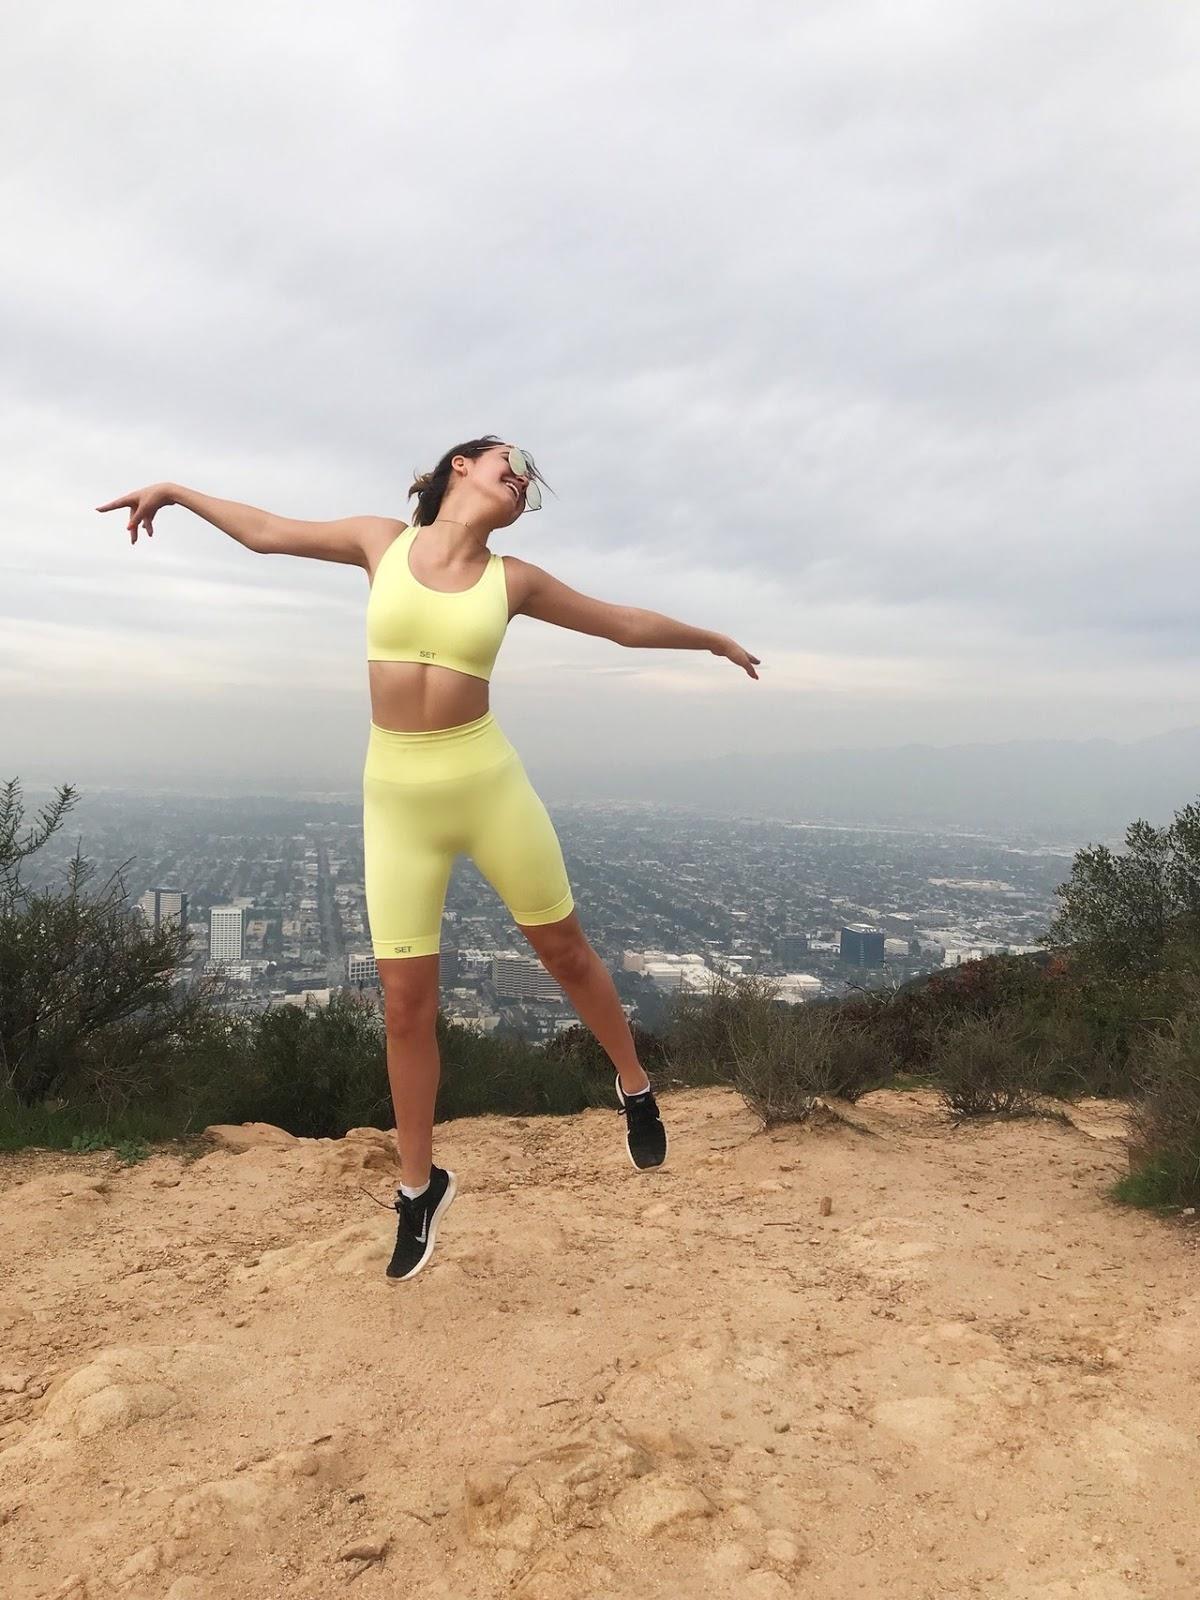 Bailee Madison - Personal Pics - 02/05/2019